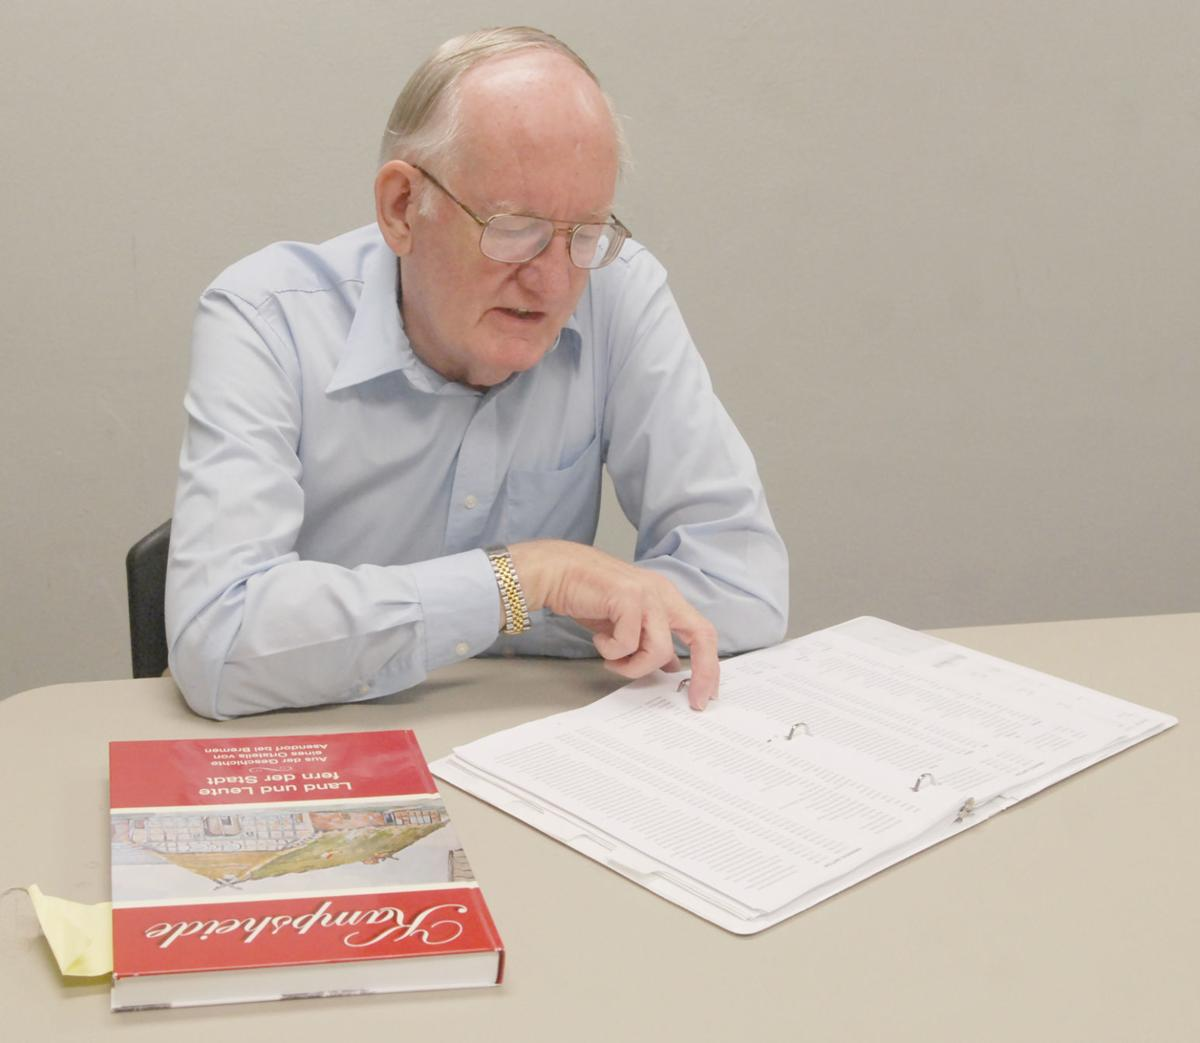 Man looking over genealogy book